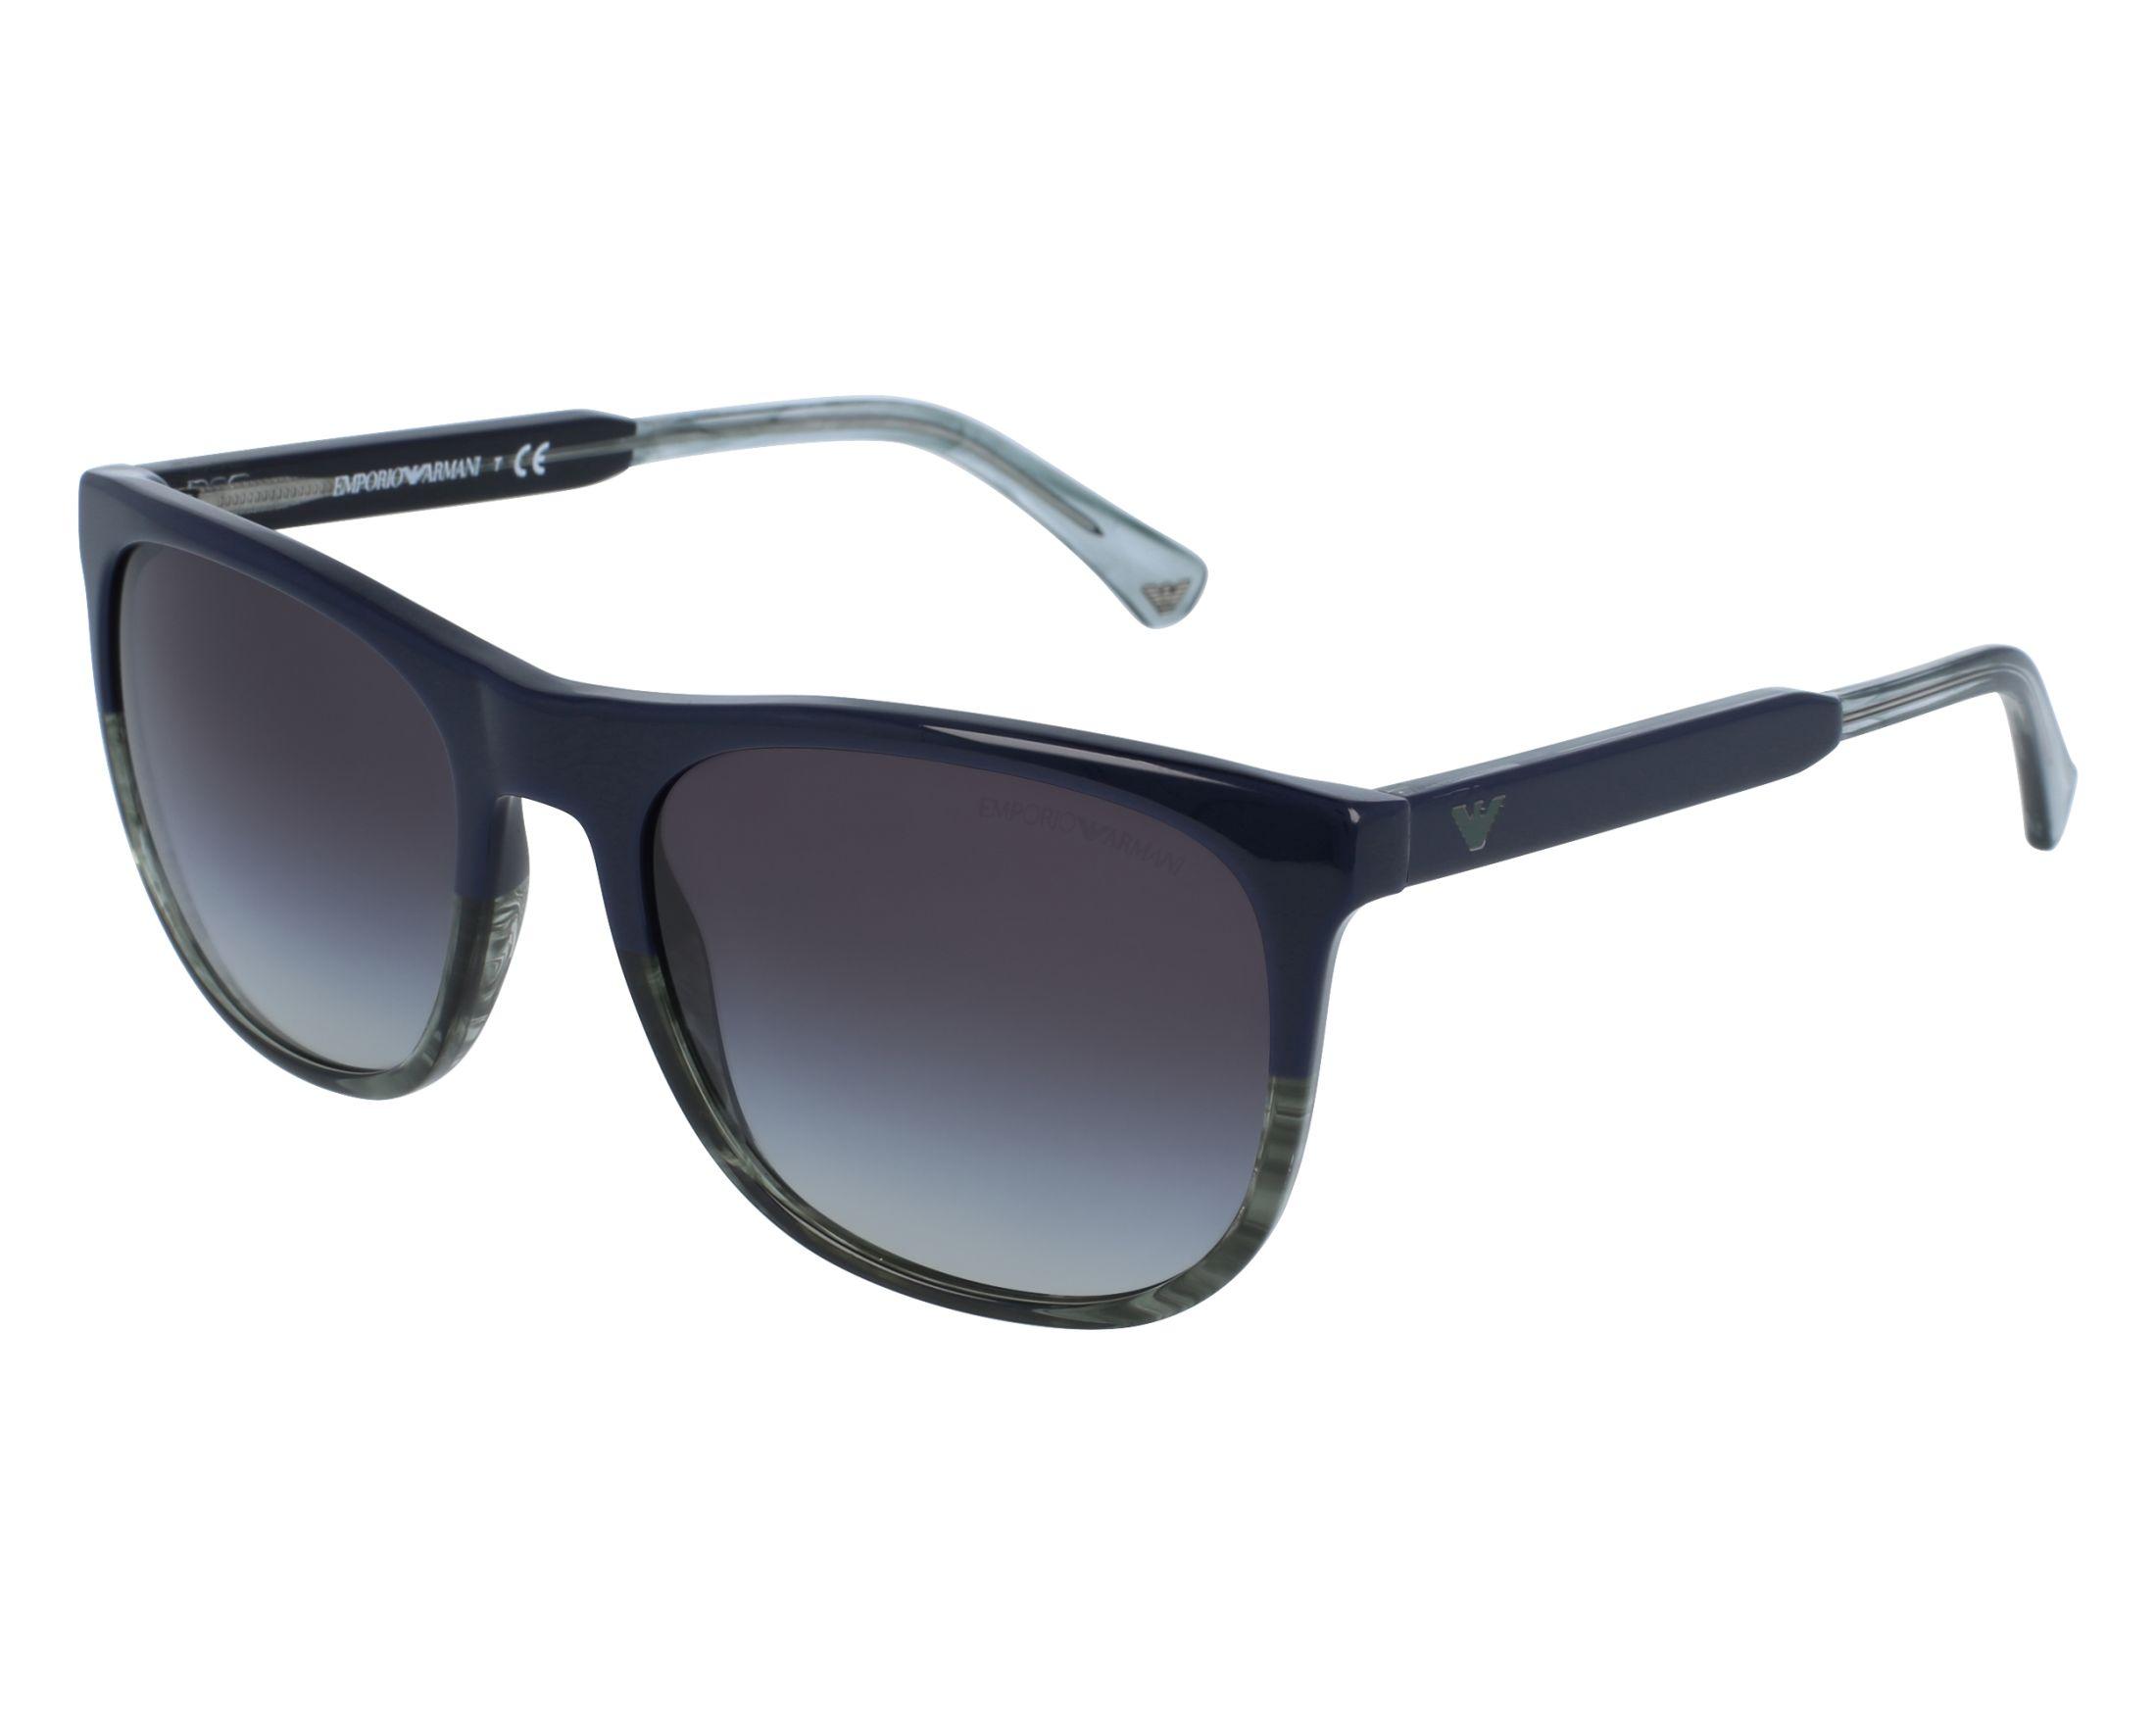 Emporio Armani EA4099 Sonnenbrille Schwarz / Grau 556687 56mm kP7z7rx5